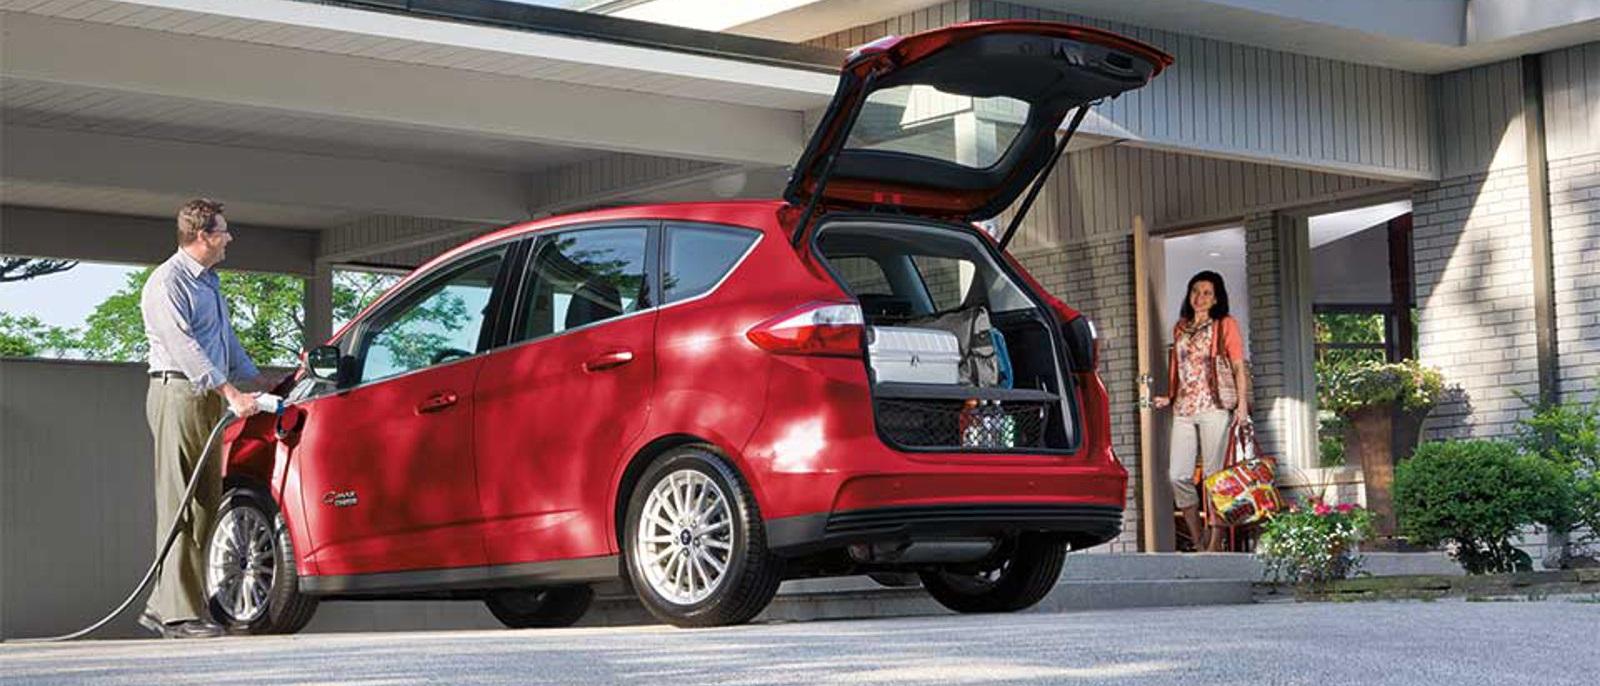 2015 Ford C-MAX Energi Hybrid Charging